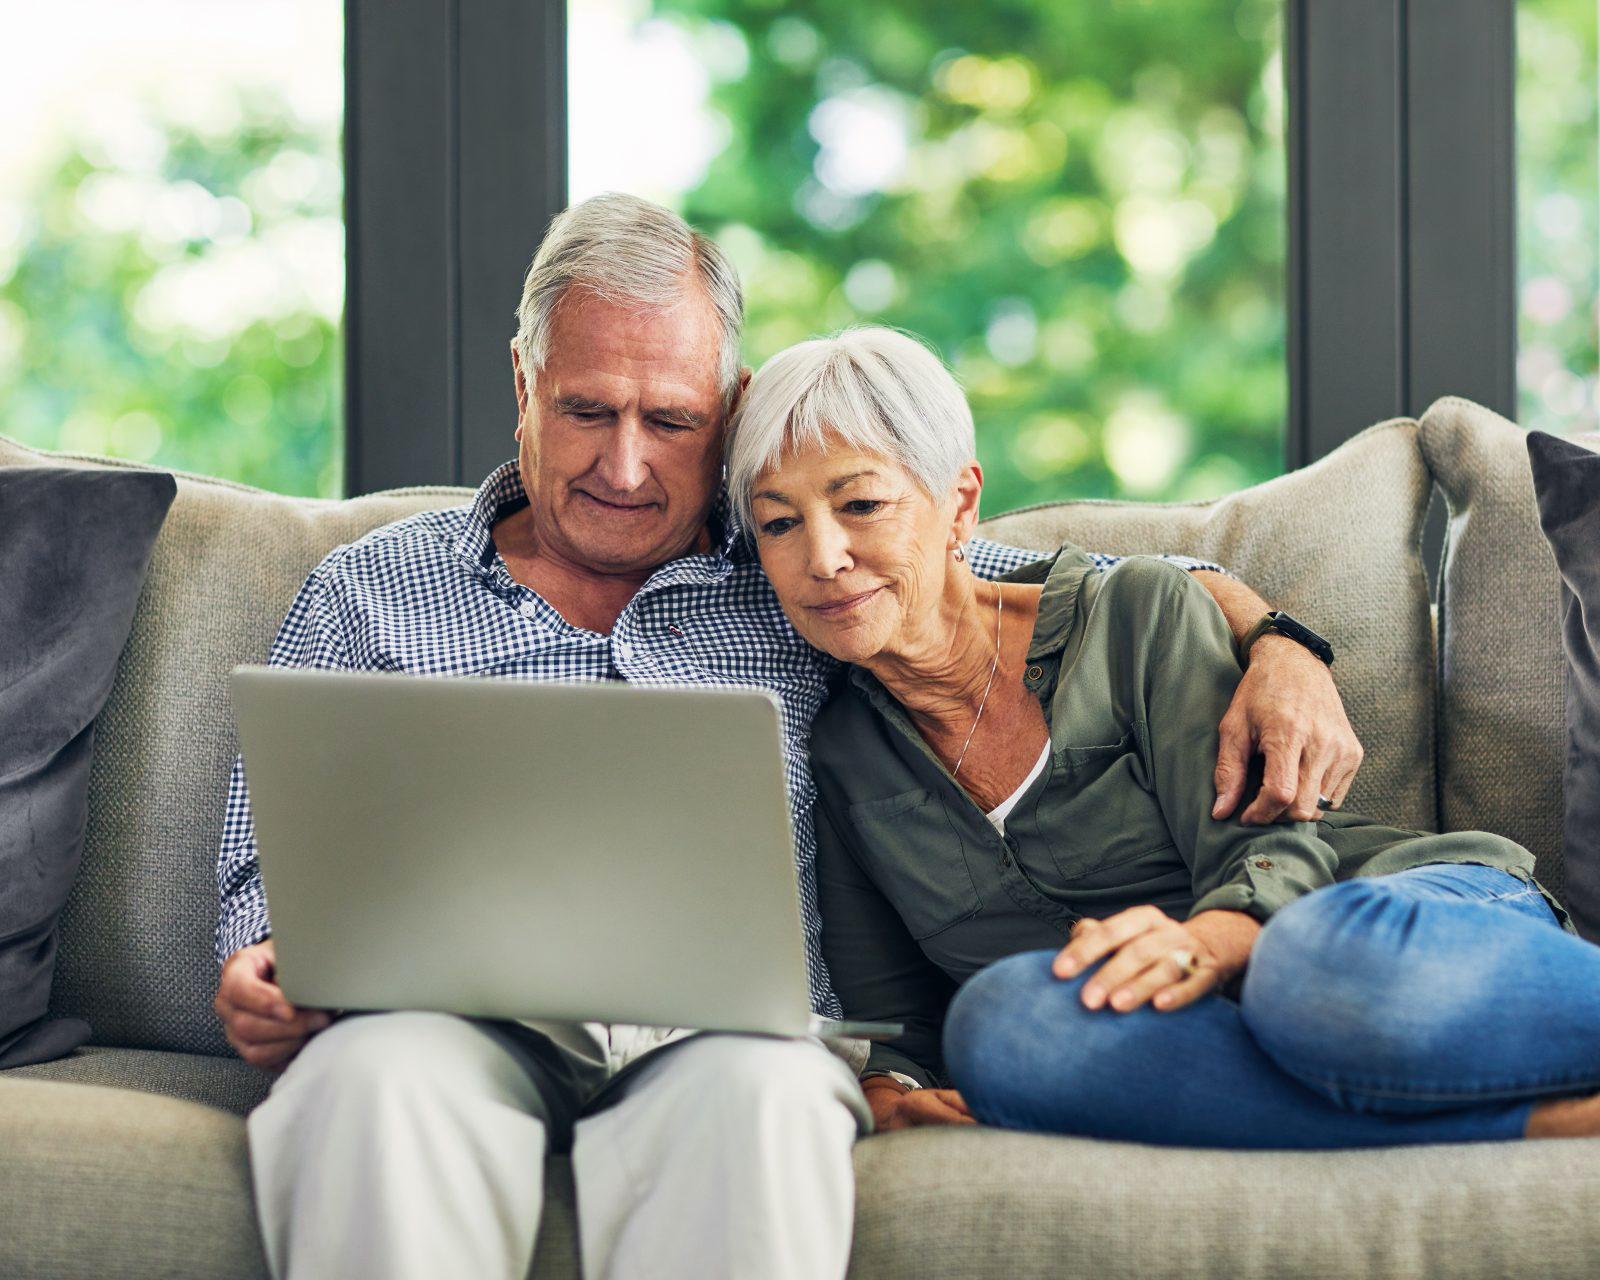 Couple reviewing finances on laptop